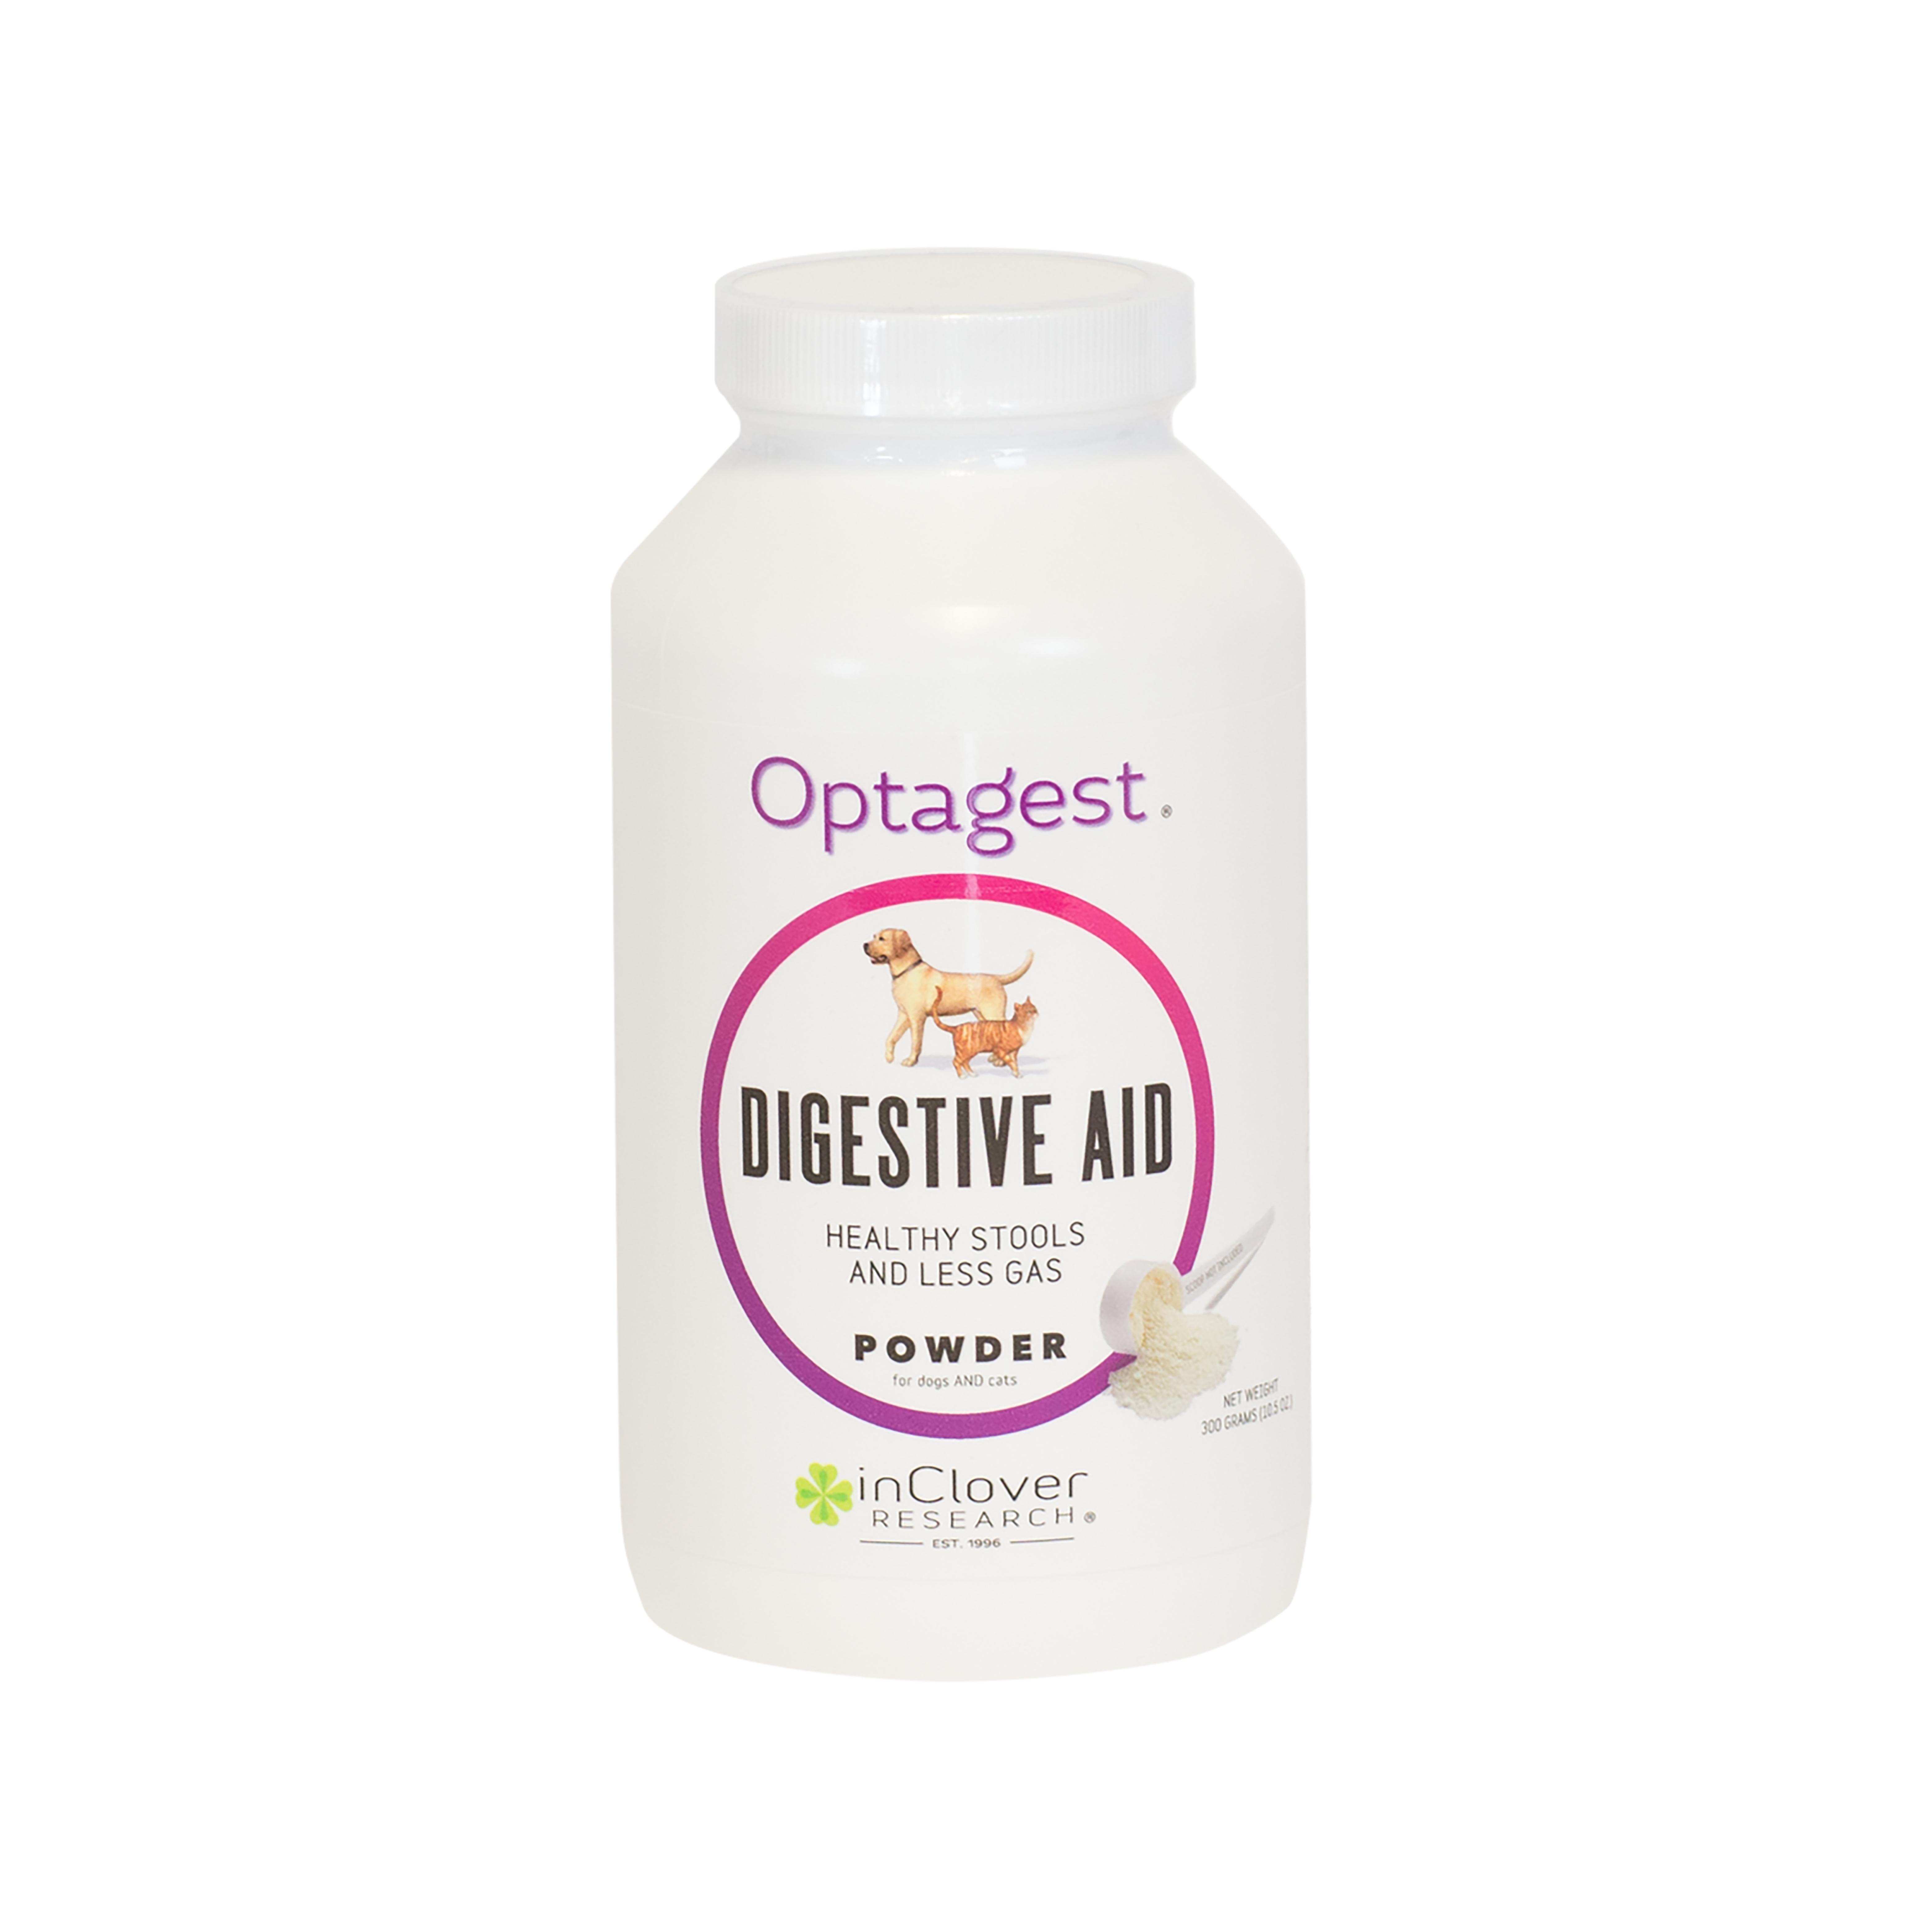 inClover K9 Optagest Digestive Aid Powder Dog Supplement, 300-g